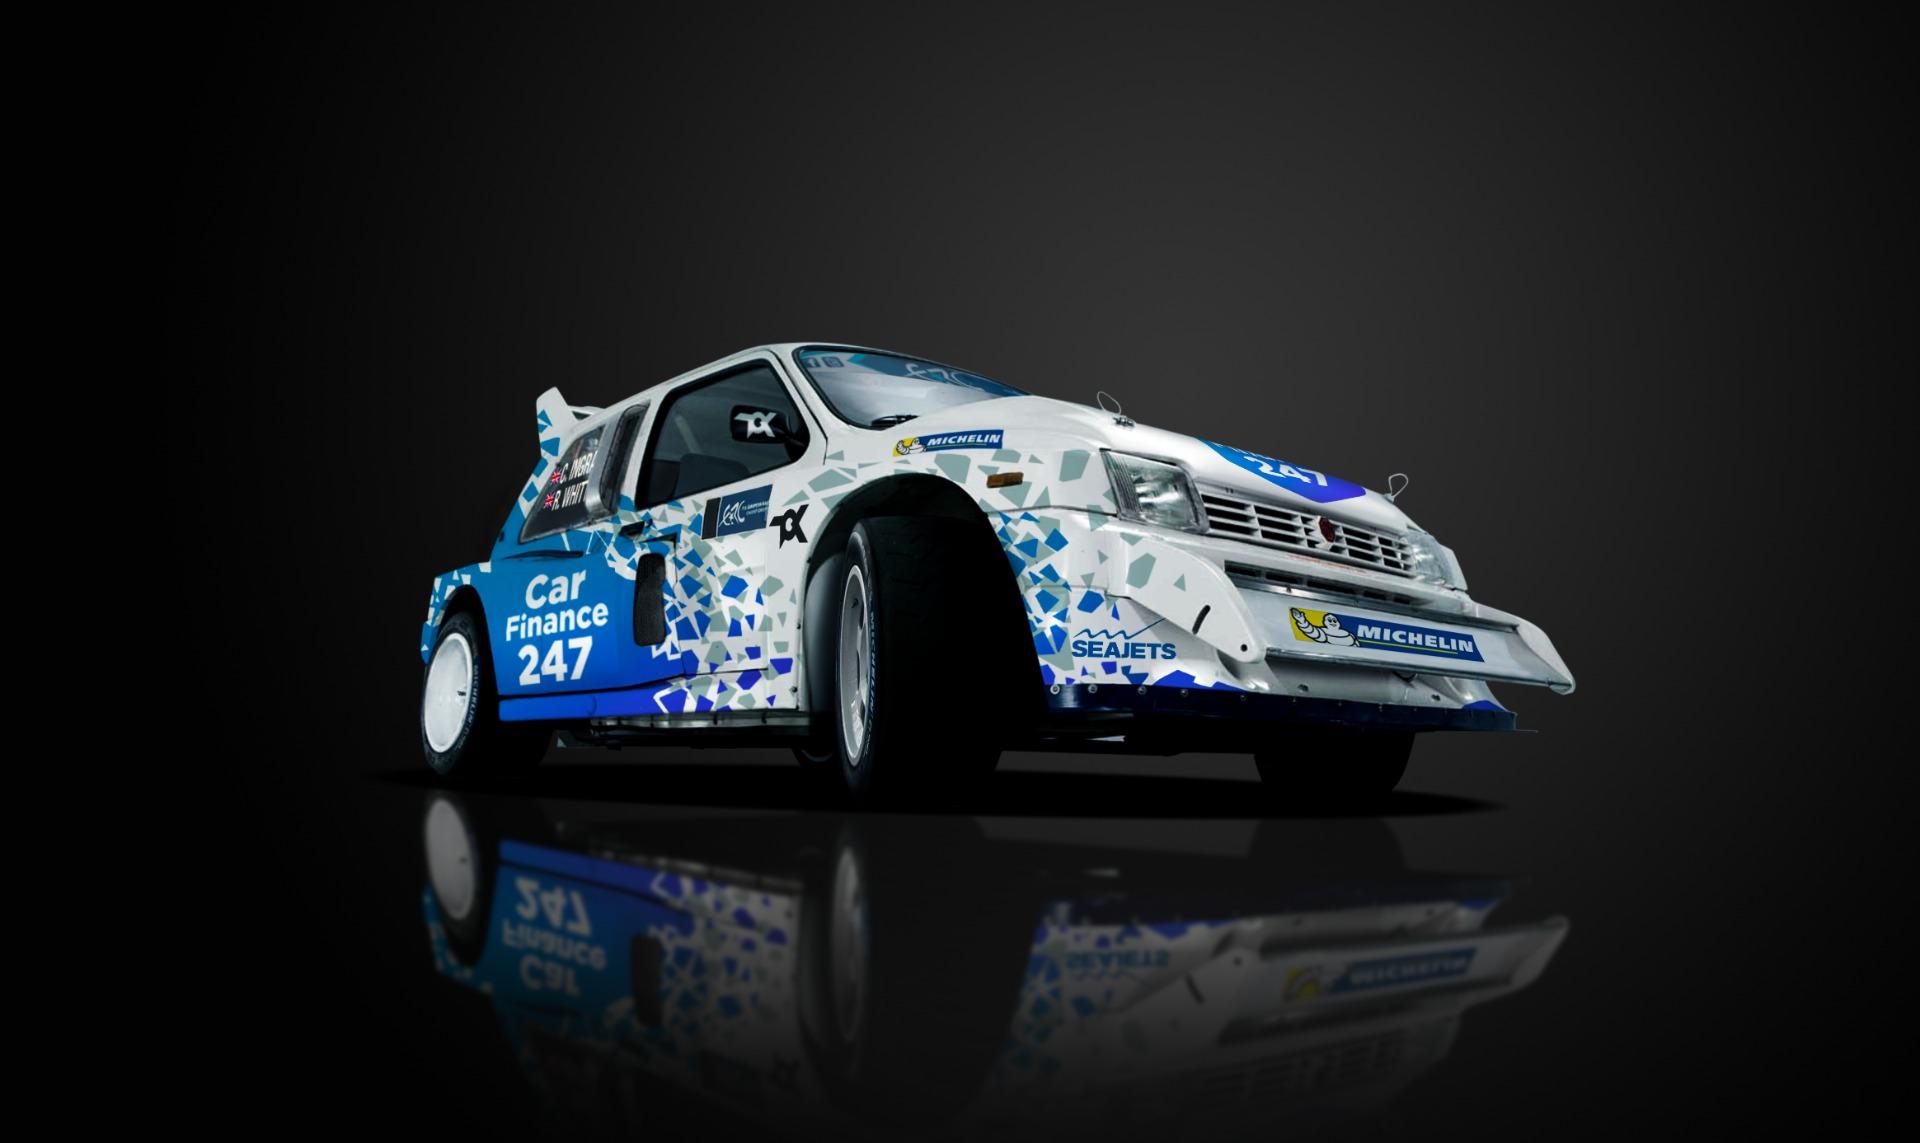 Ingram con la MG Metro 6R4 per la ERC Legends Series